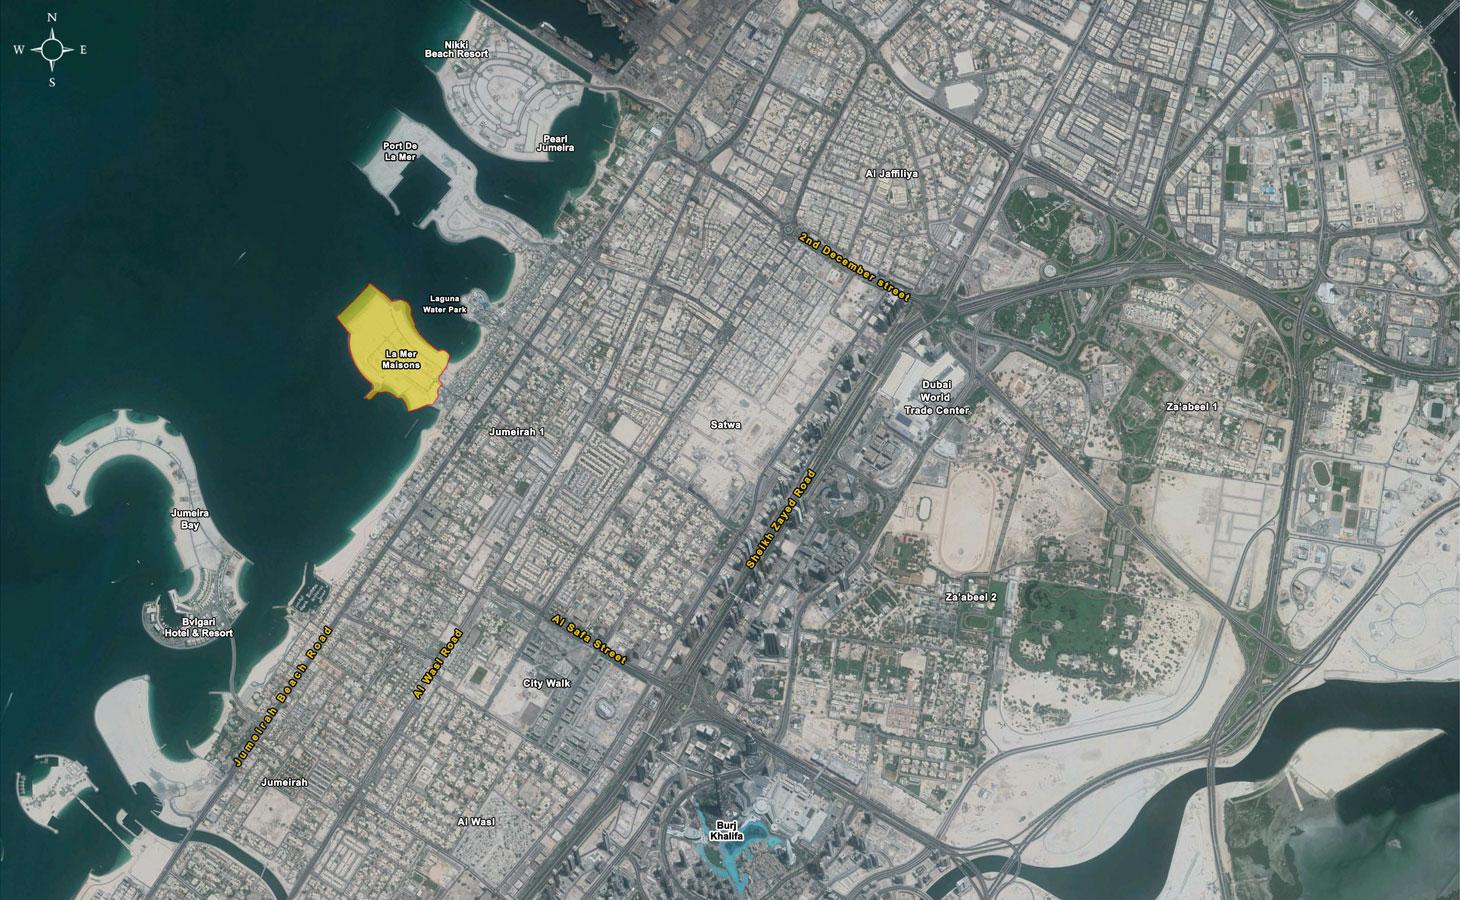 La Mer Maisons -  Location Plan